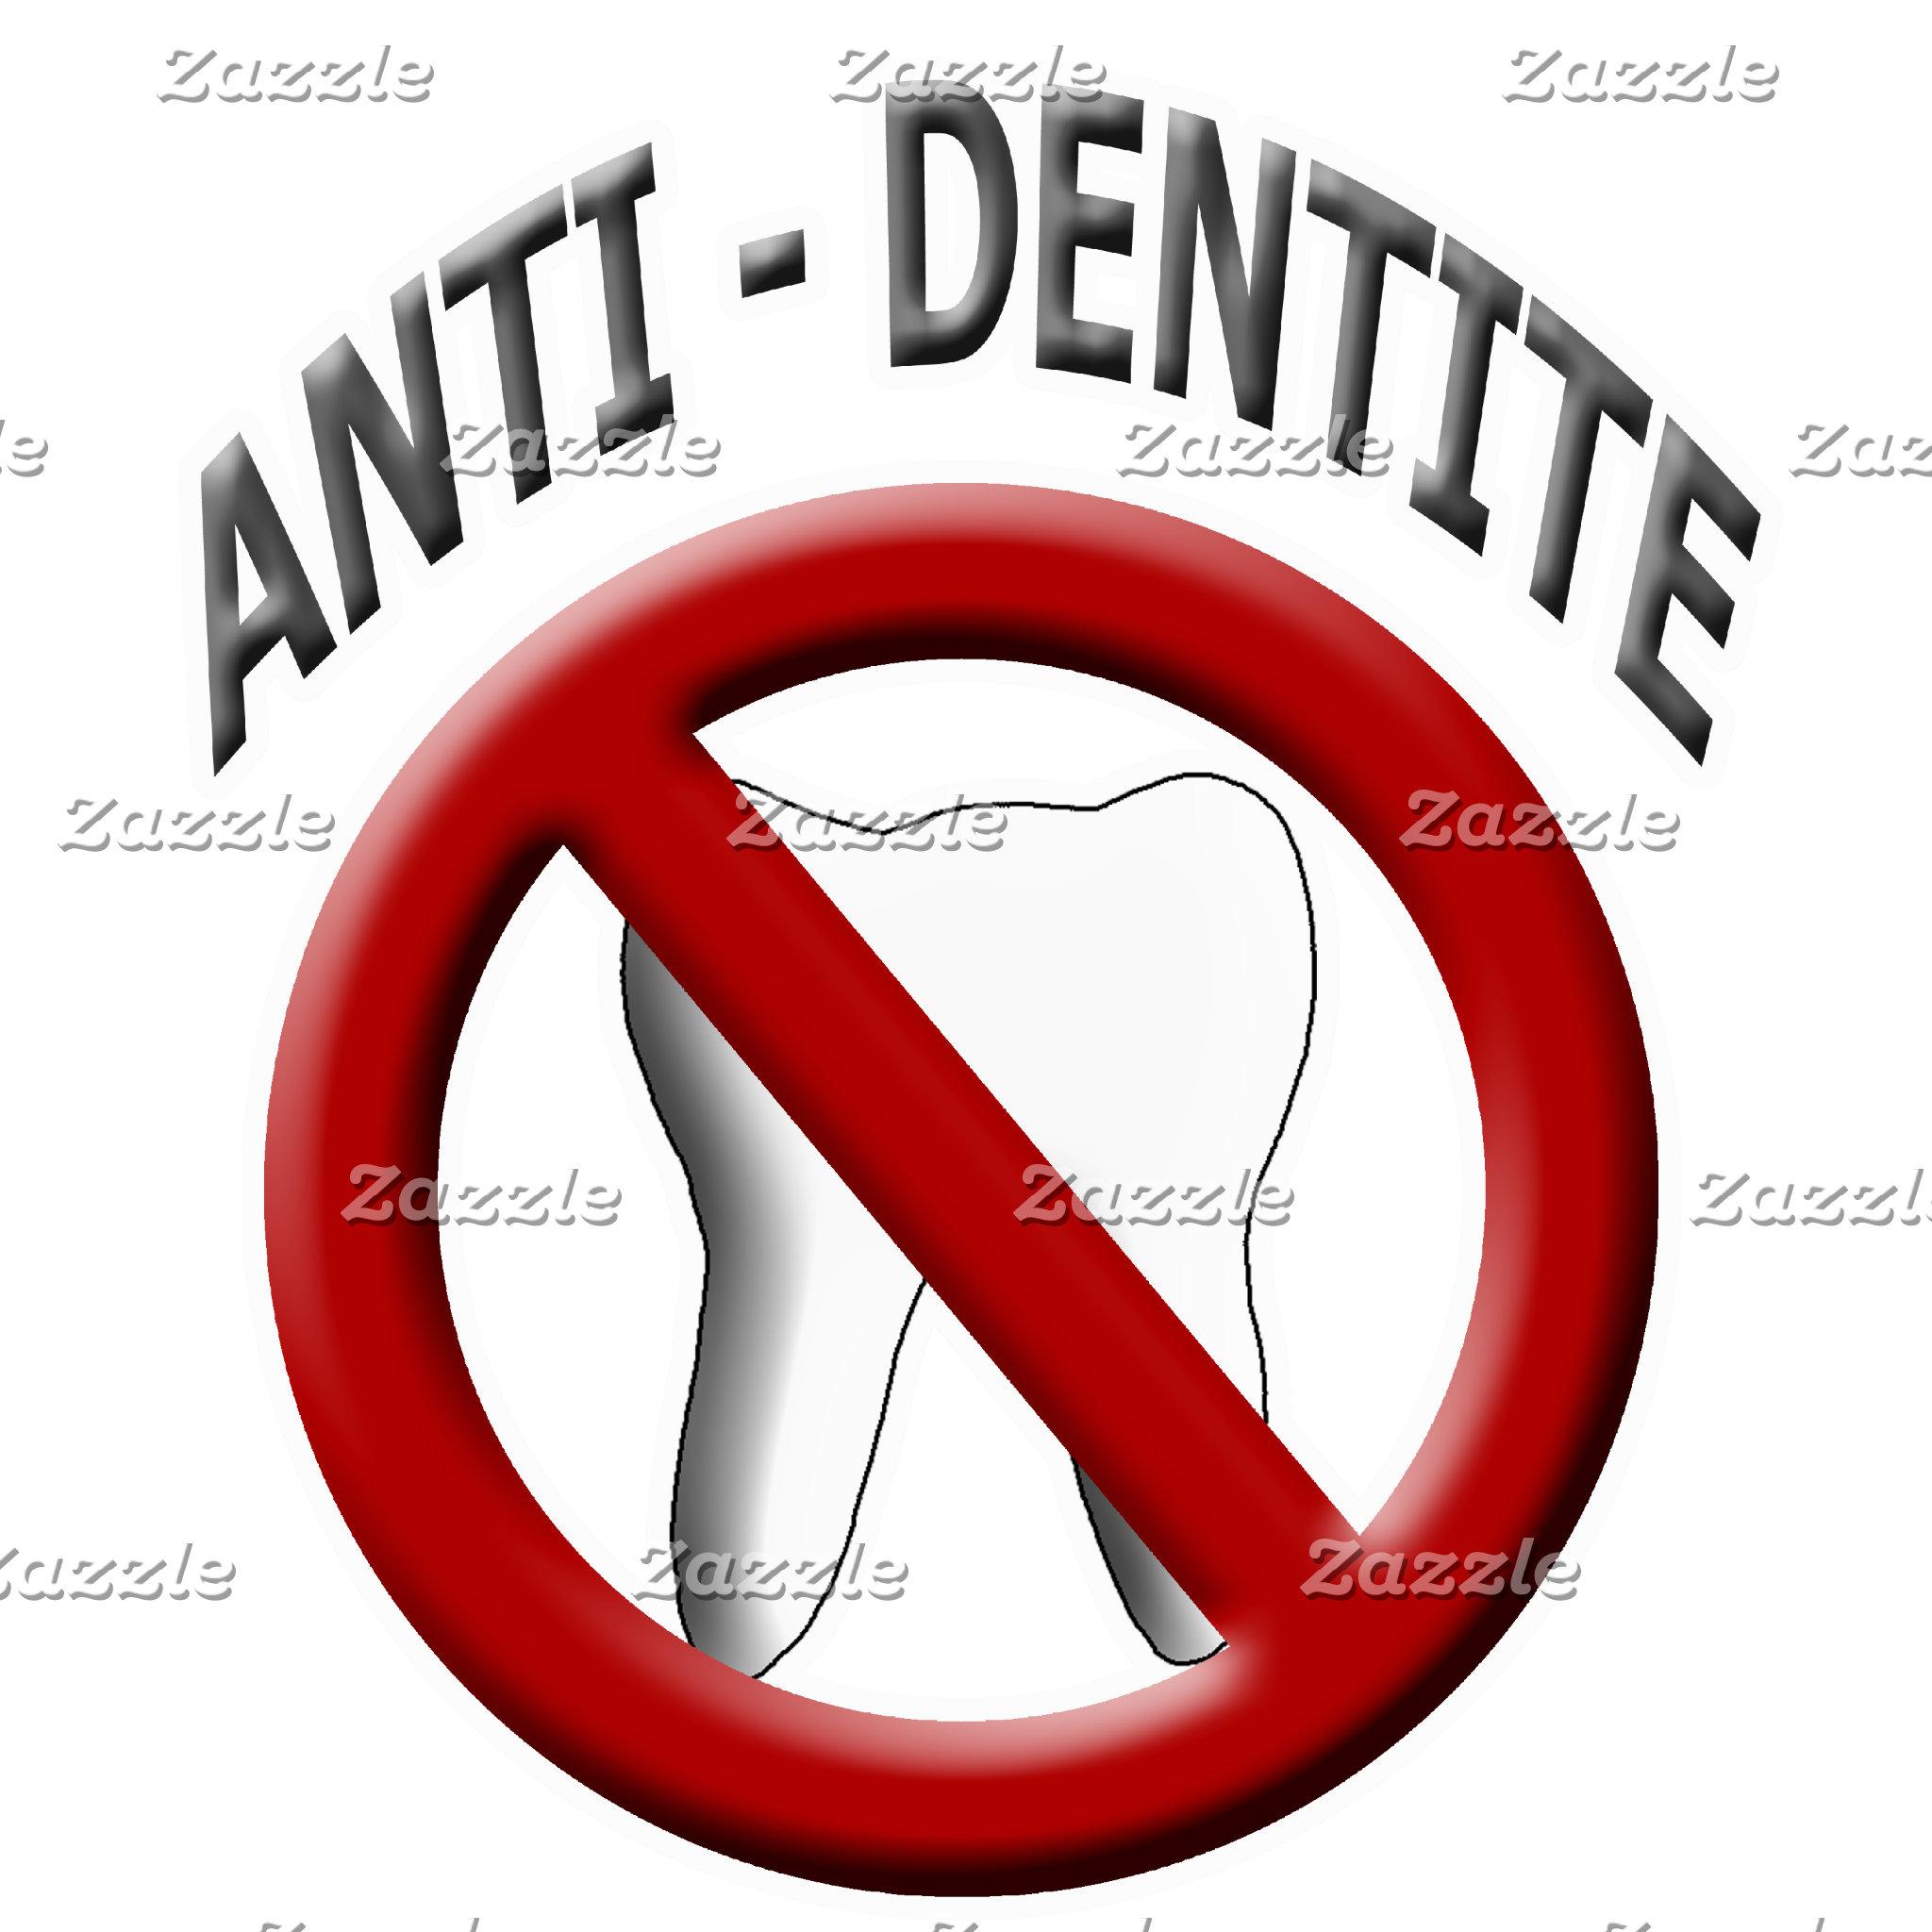 Television - Anti - Dentite